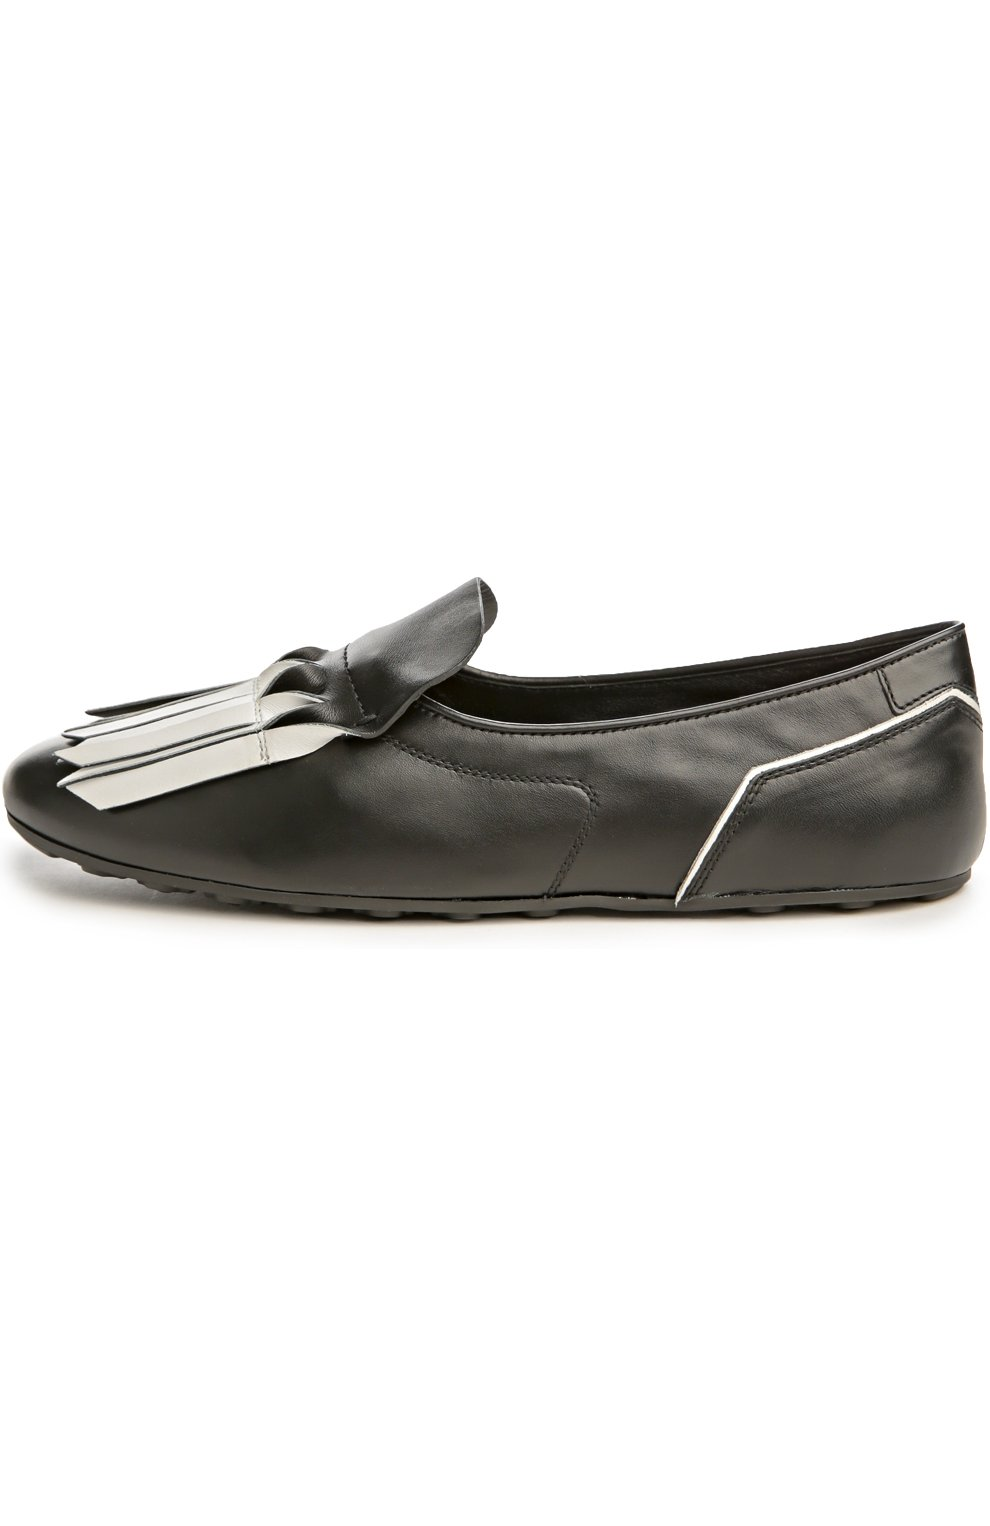 Туфли домашние Gomma с бахромой | Фото №1